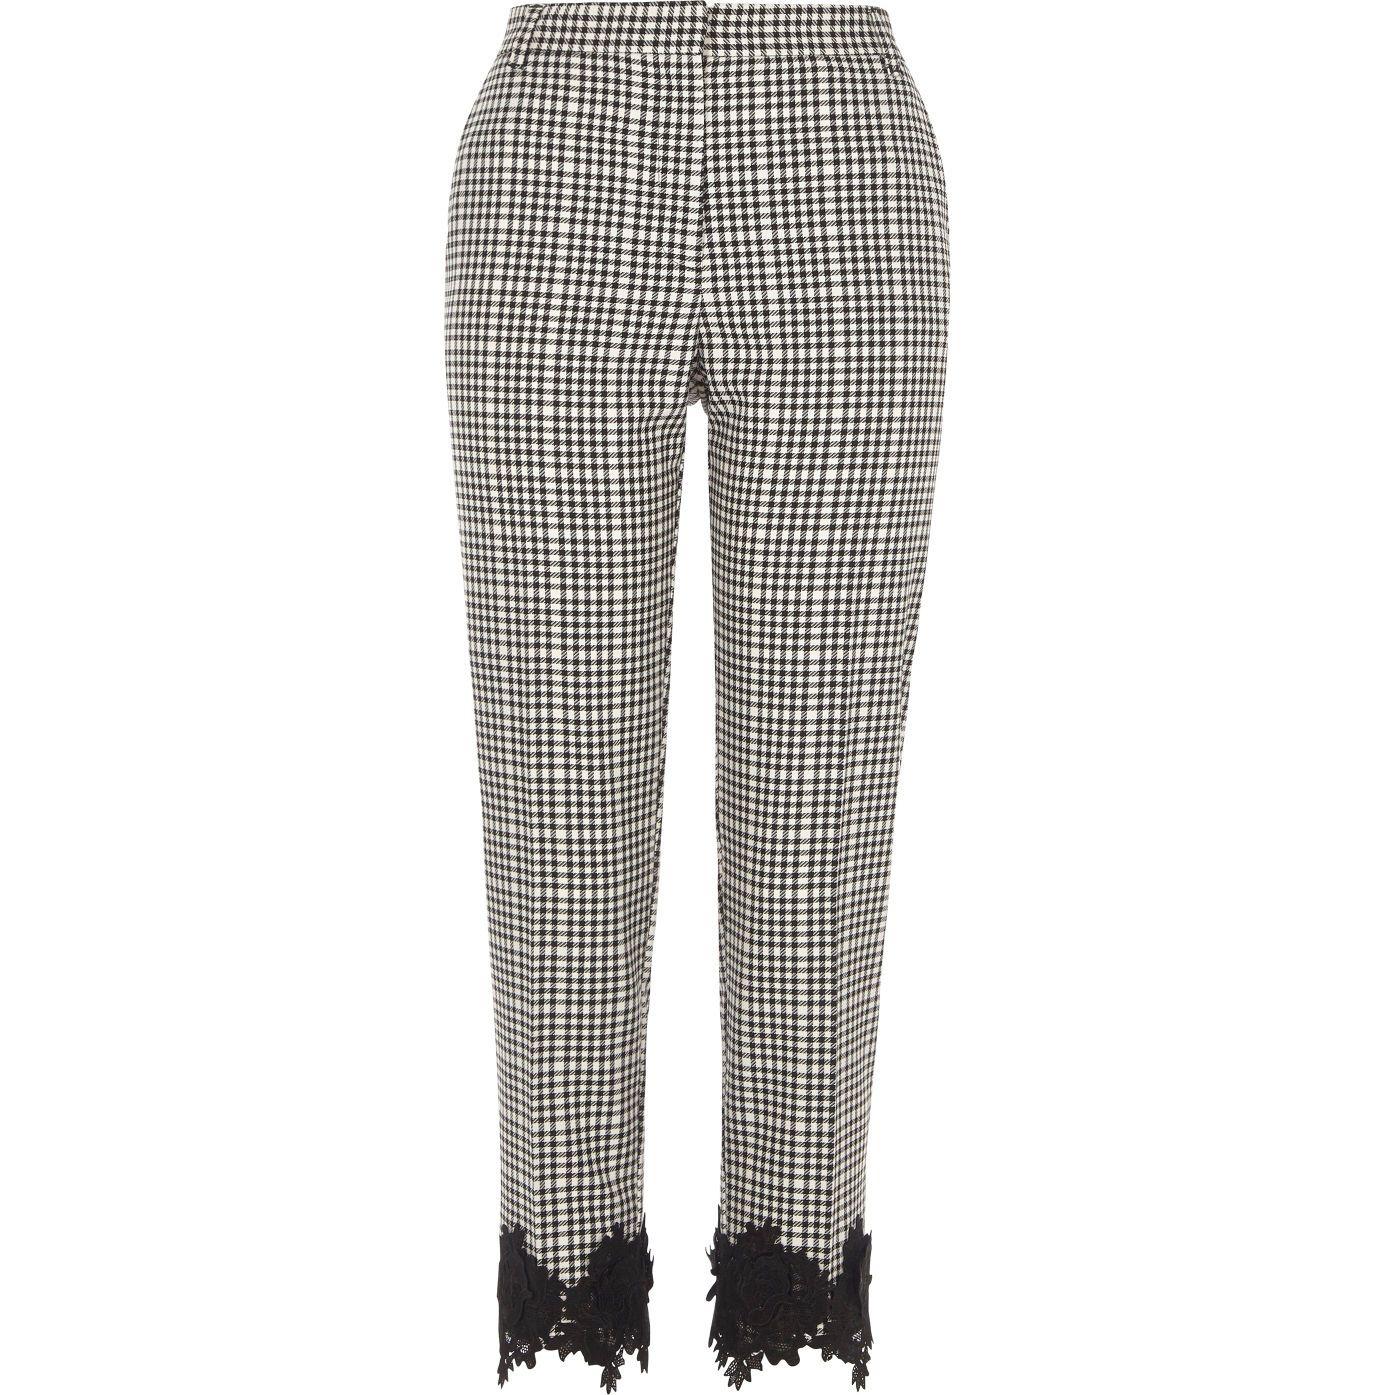 8f016e1e471f Black gingham crochet hem cropped trousers - cropped trousers - trousers -  women